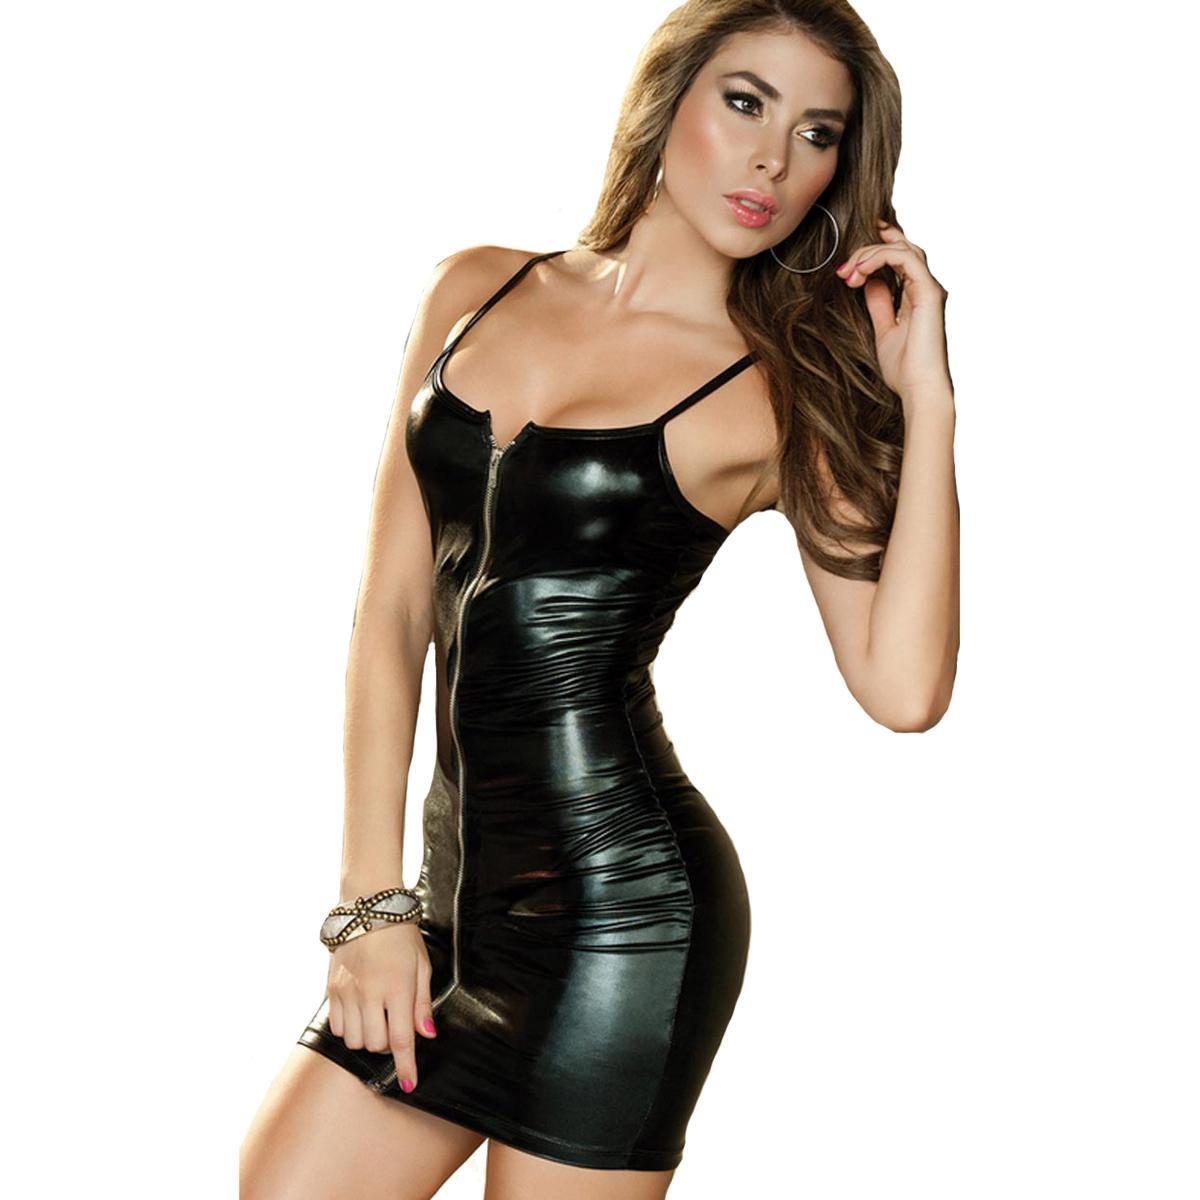 2a75f533fd8f Black Sexy Lingerie Evening Leather Nightgown Dress Sexy Bodycon Bandage  Clubwear Latex Costumes Women Nightdress Babydolls D18110902 Sexy Dress  Bustier ...